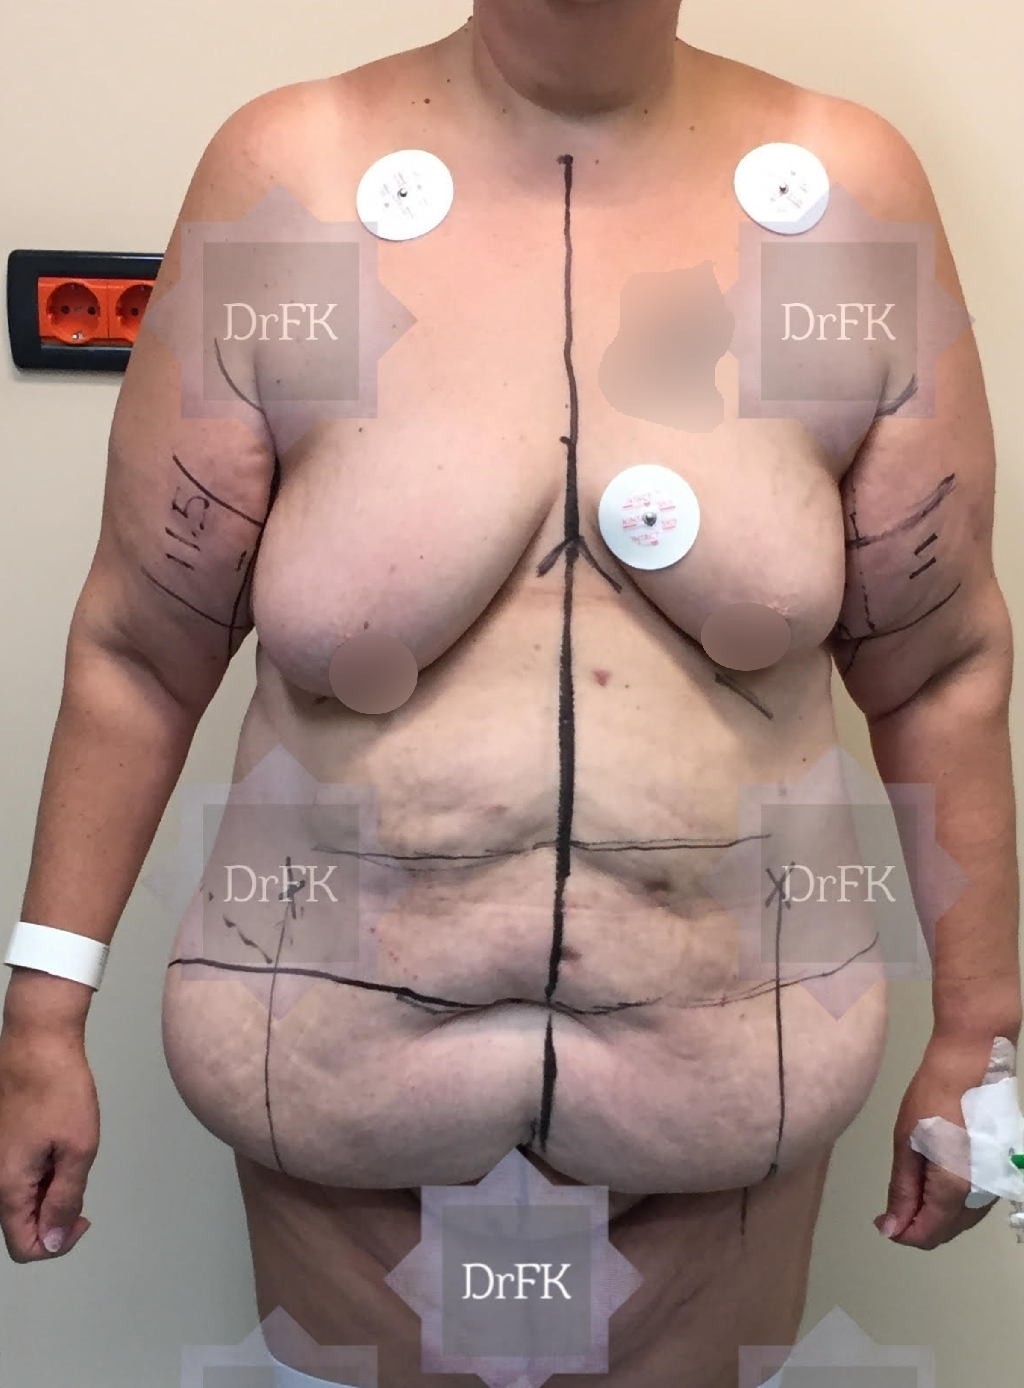 breastup01a